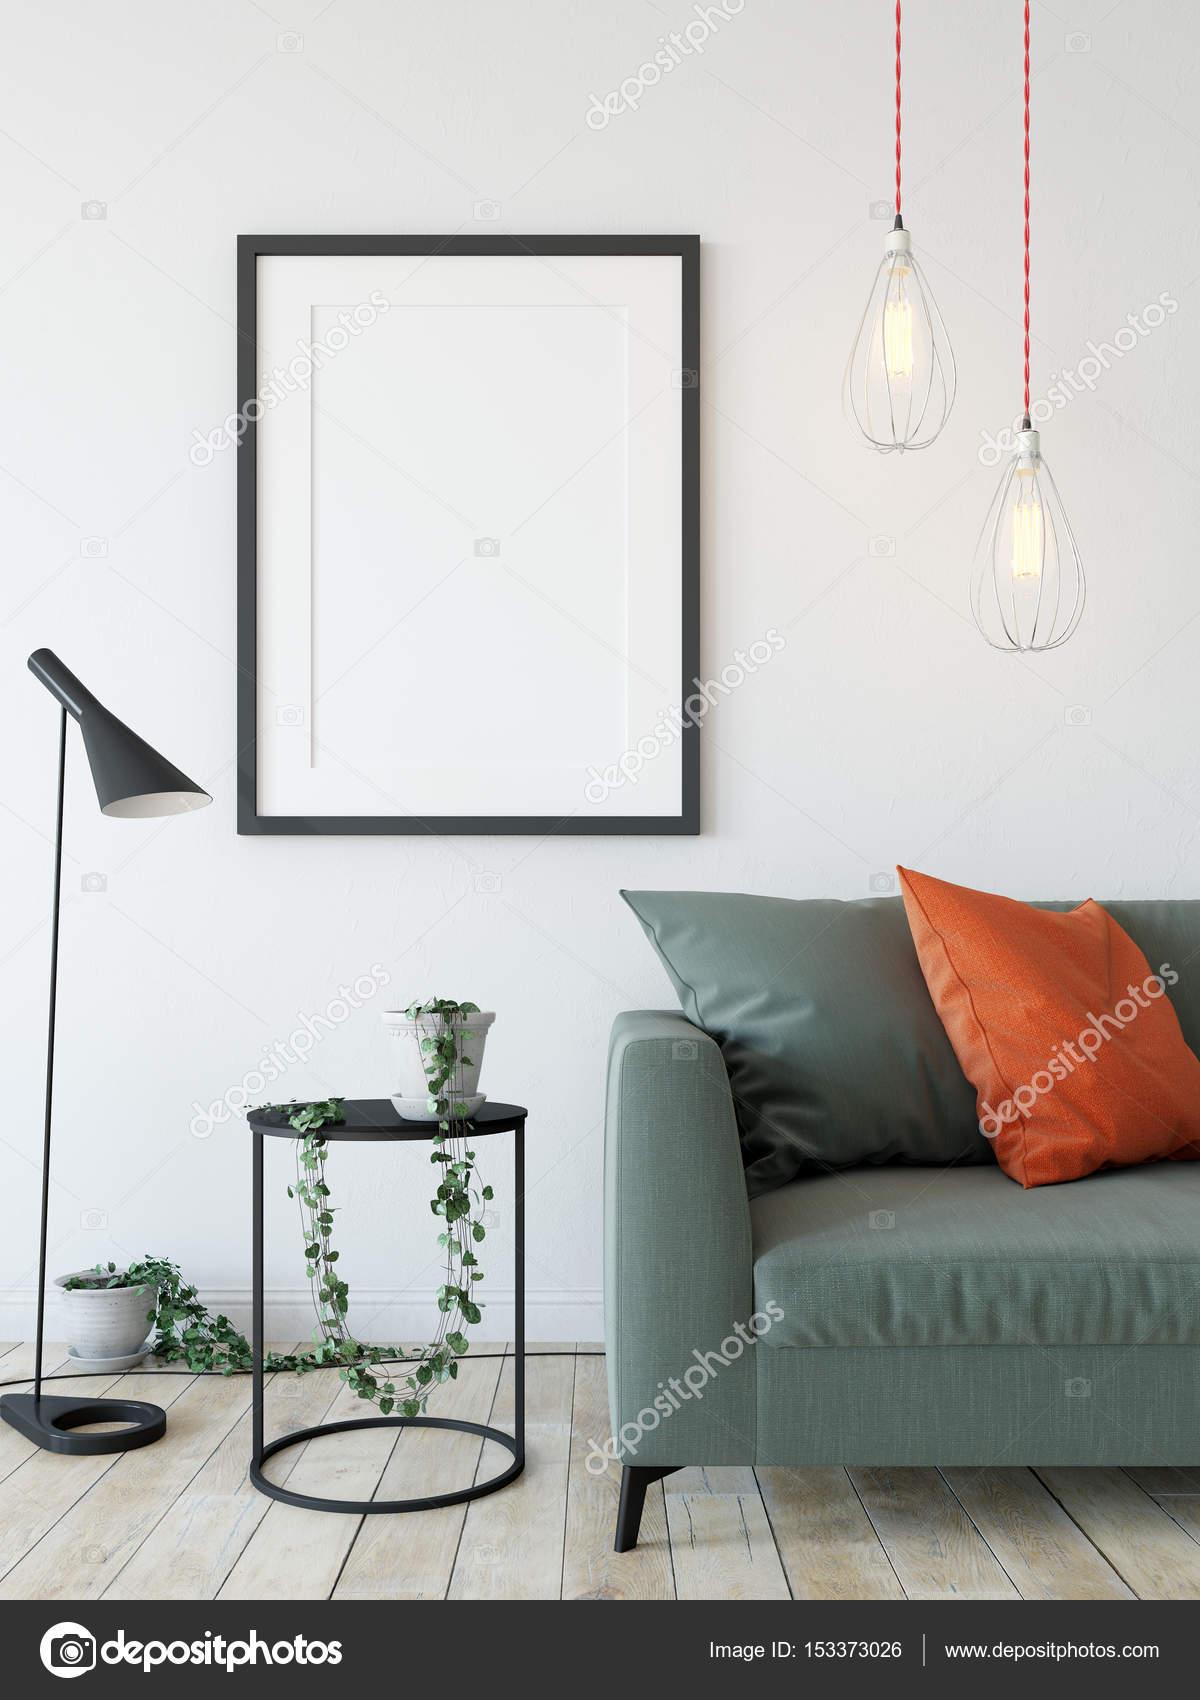 mock up posters in living room interior. — Stock Photo © Yuri-U ...